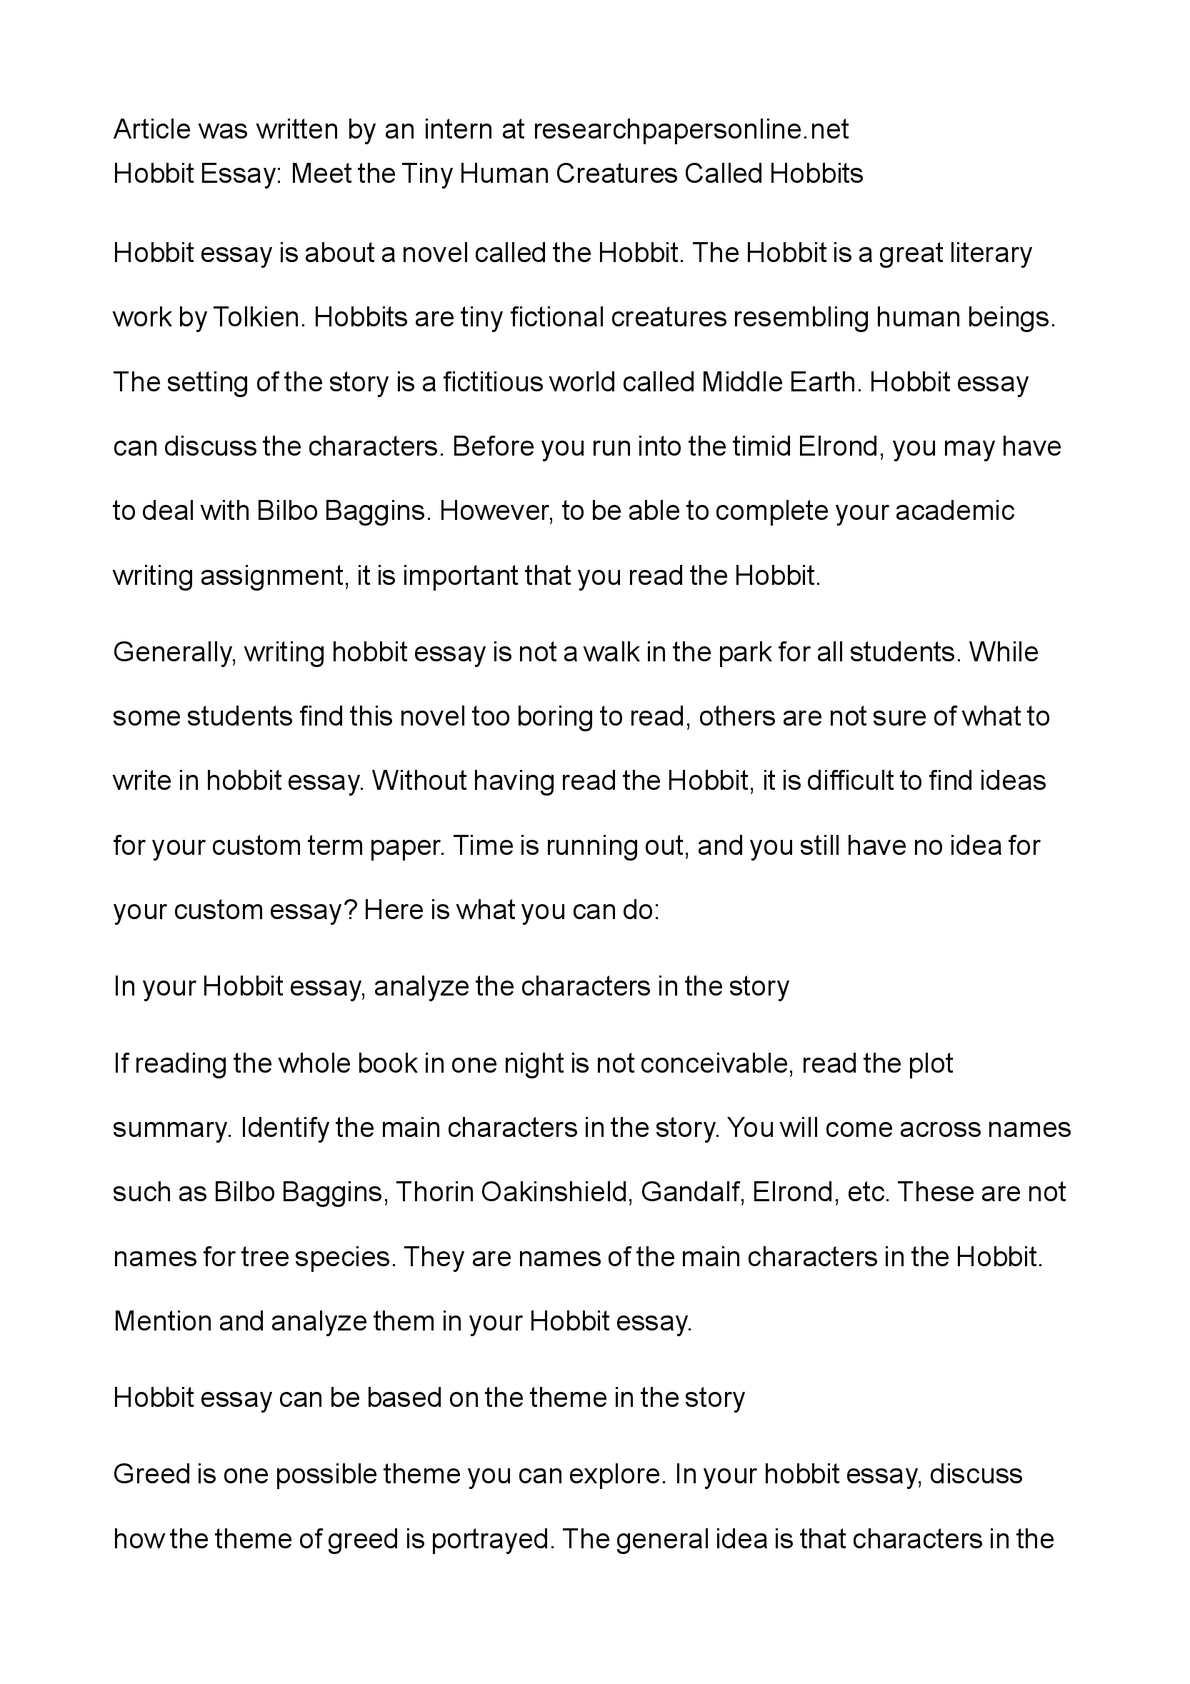 Calamo  Hobbit Essay Meet The Tiny Human Creatures Called Hobbits  Sample High School Essay also Graduating High School Essay  Analysis And Synthesis Essay